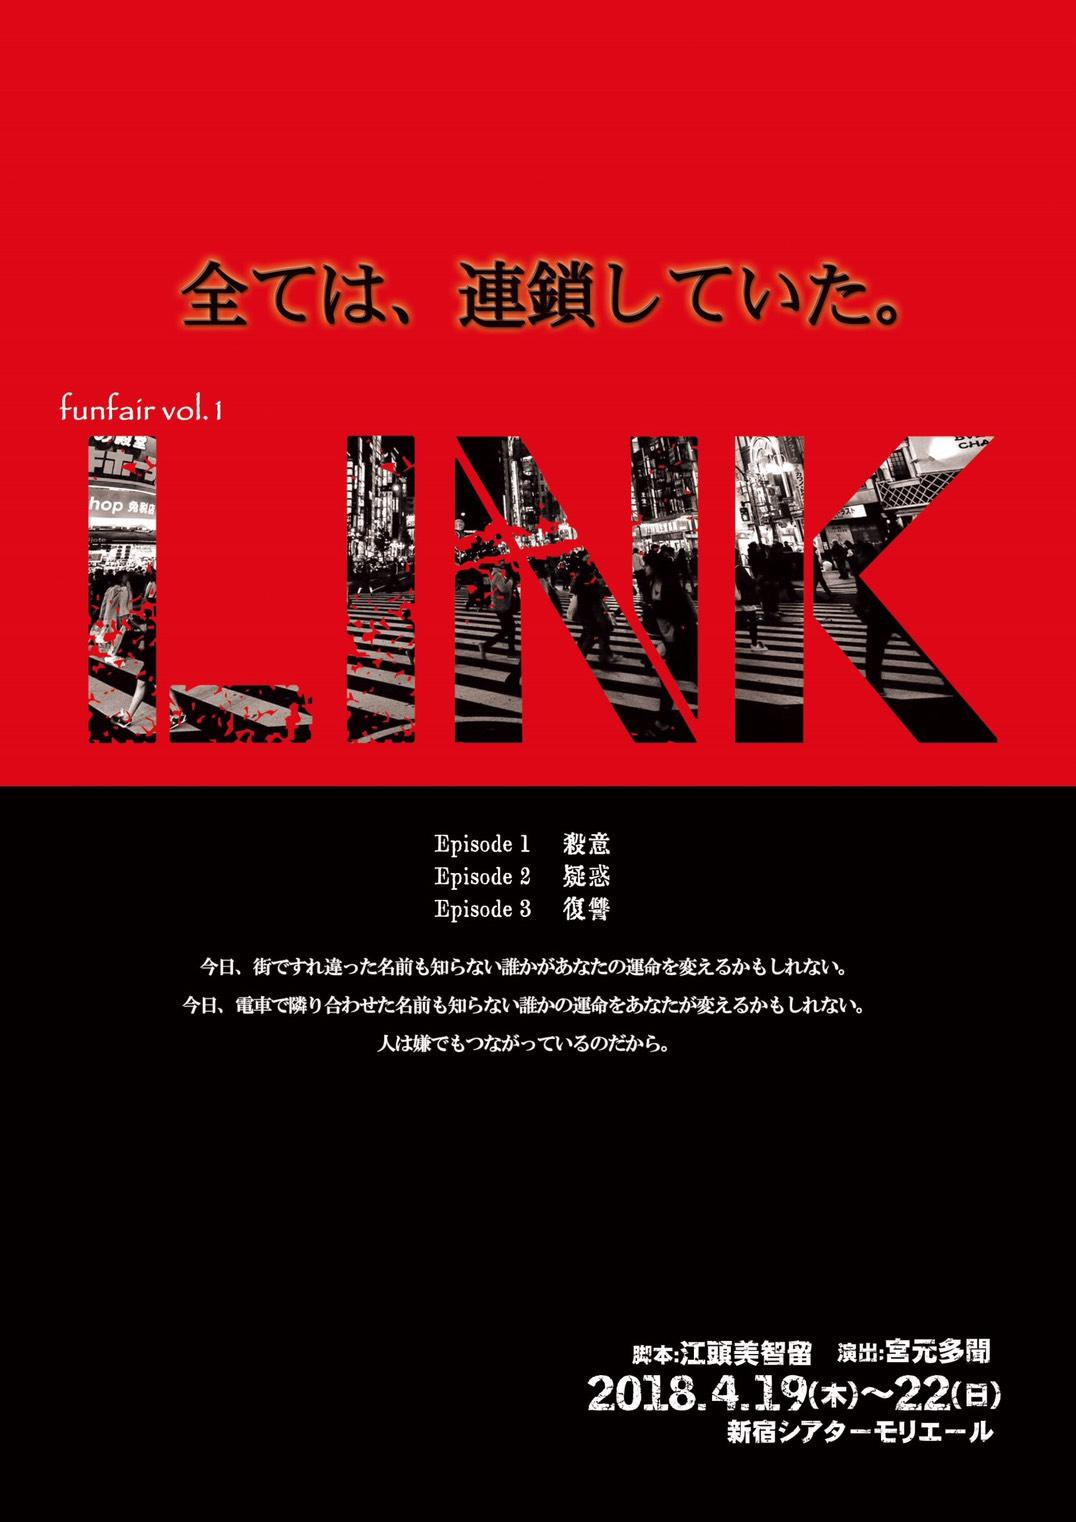 【矢原加奈子出演】funfair旗揚げ公演【LINK】情報